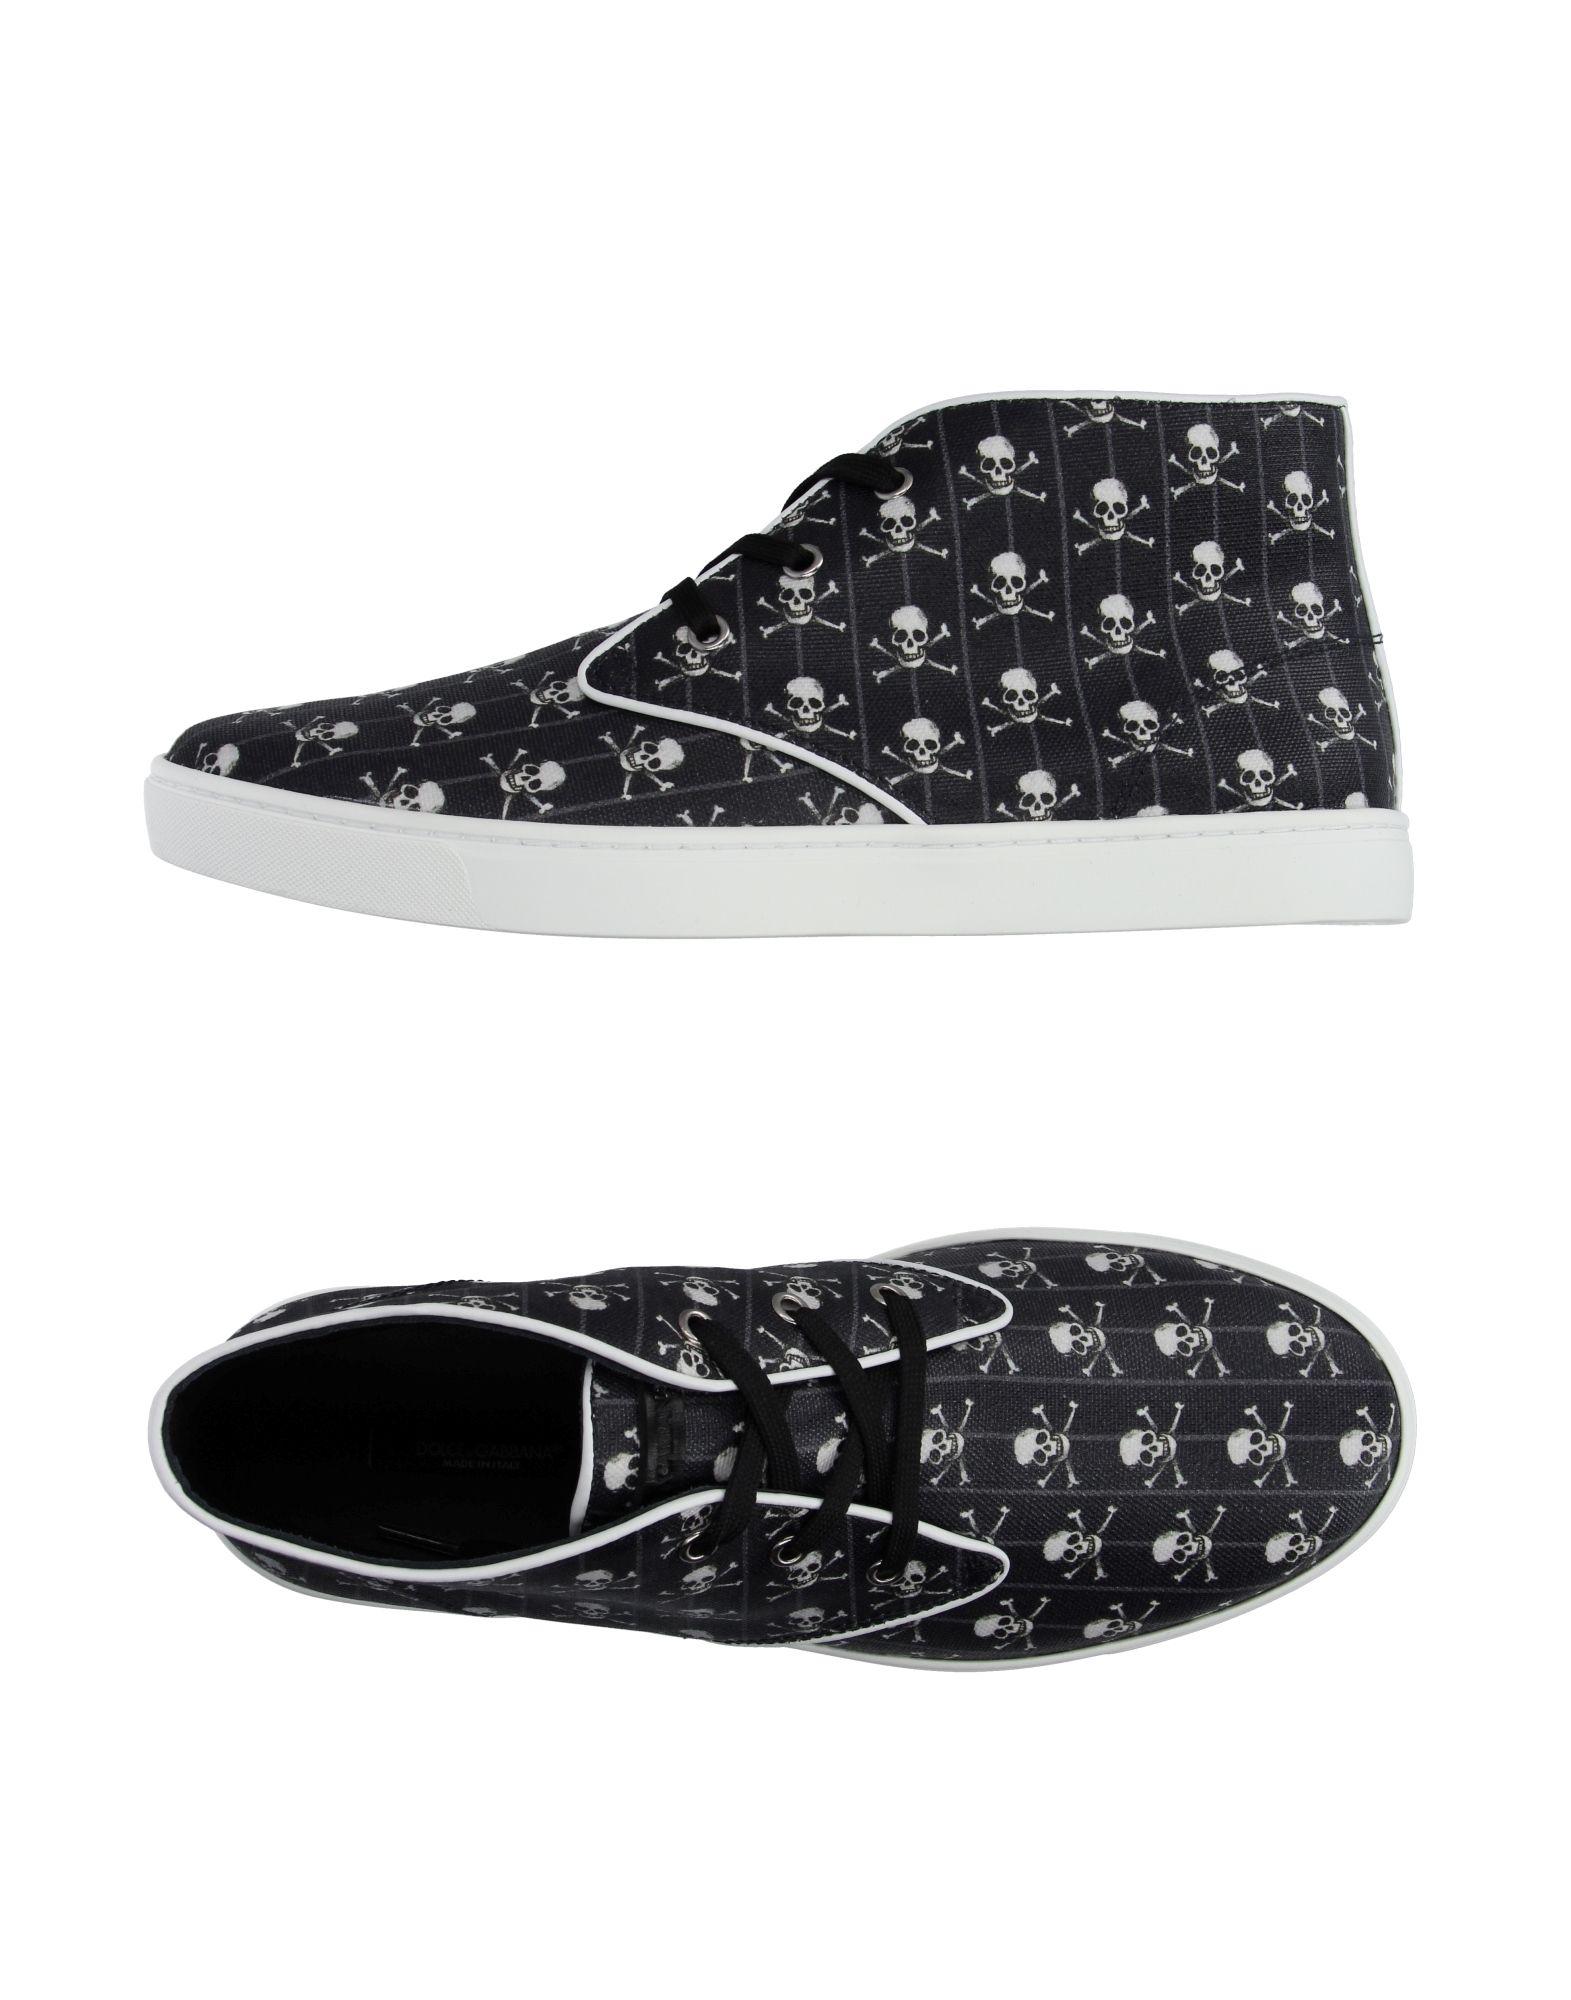 Dolce & Gabbana  Sneakers Herren  Gabbana 11061963FS ae7ed1